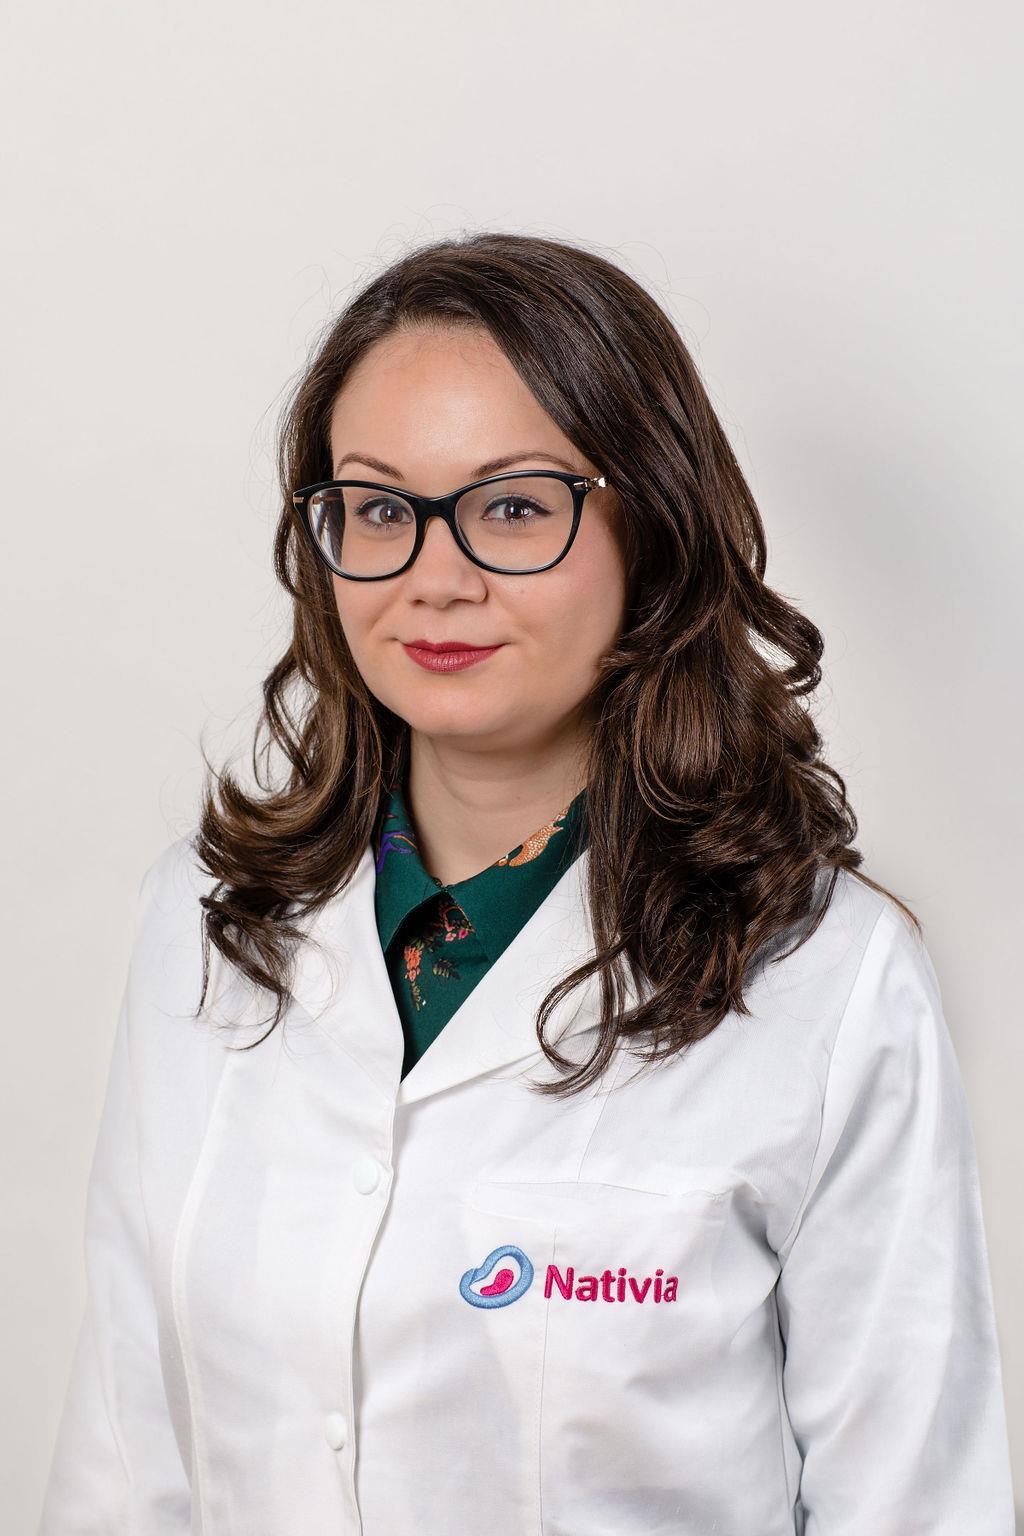 Dr. Ruxandra Cigaran